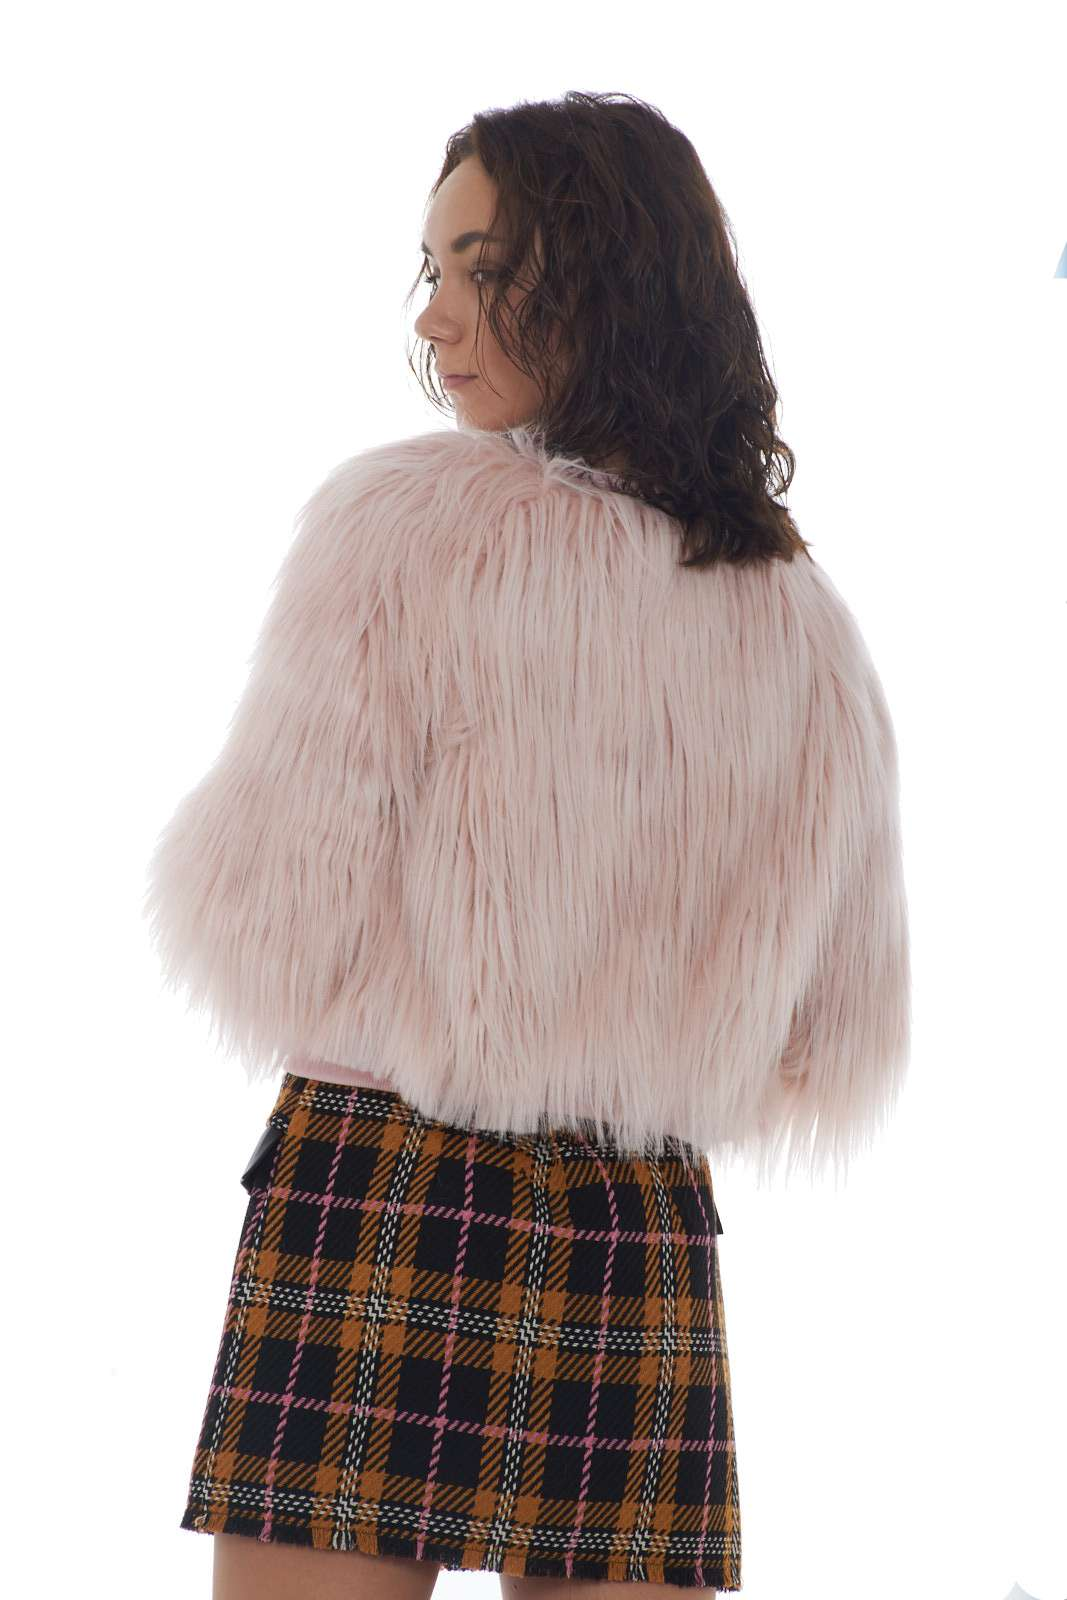 https://www.parmax.com/media/catalog/product/a/i/AI-outlet_parmax-giacca-donna-Jaim%C3%A8-8762jPe-C.jpg